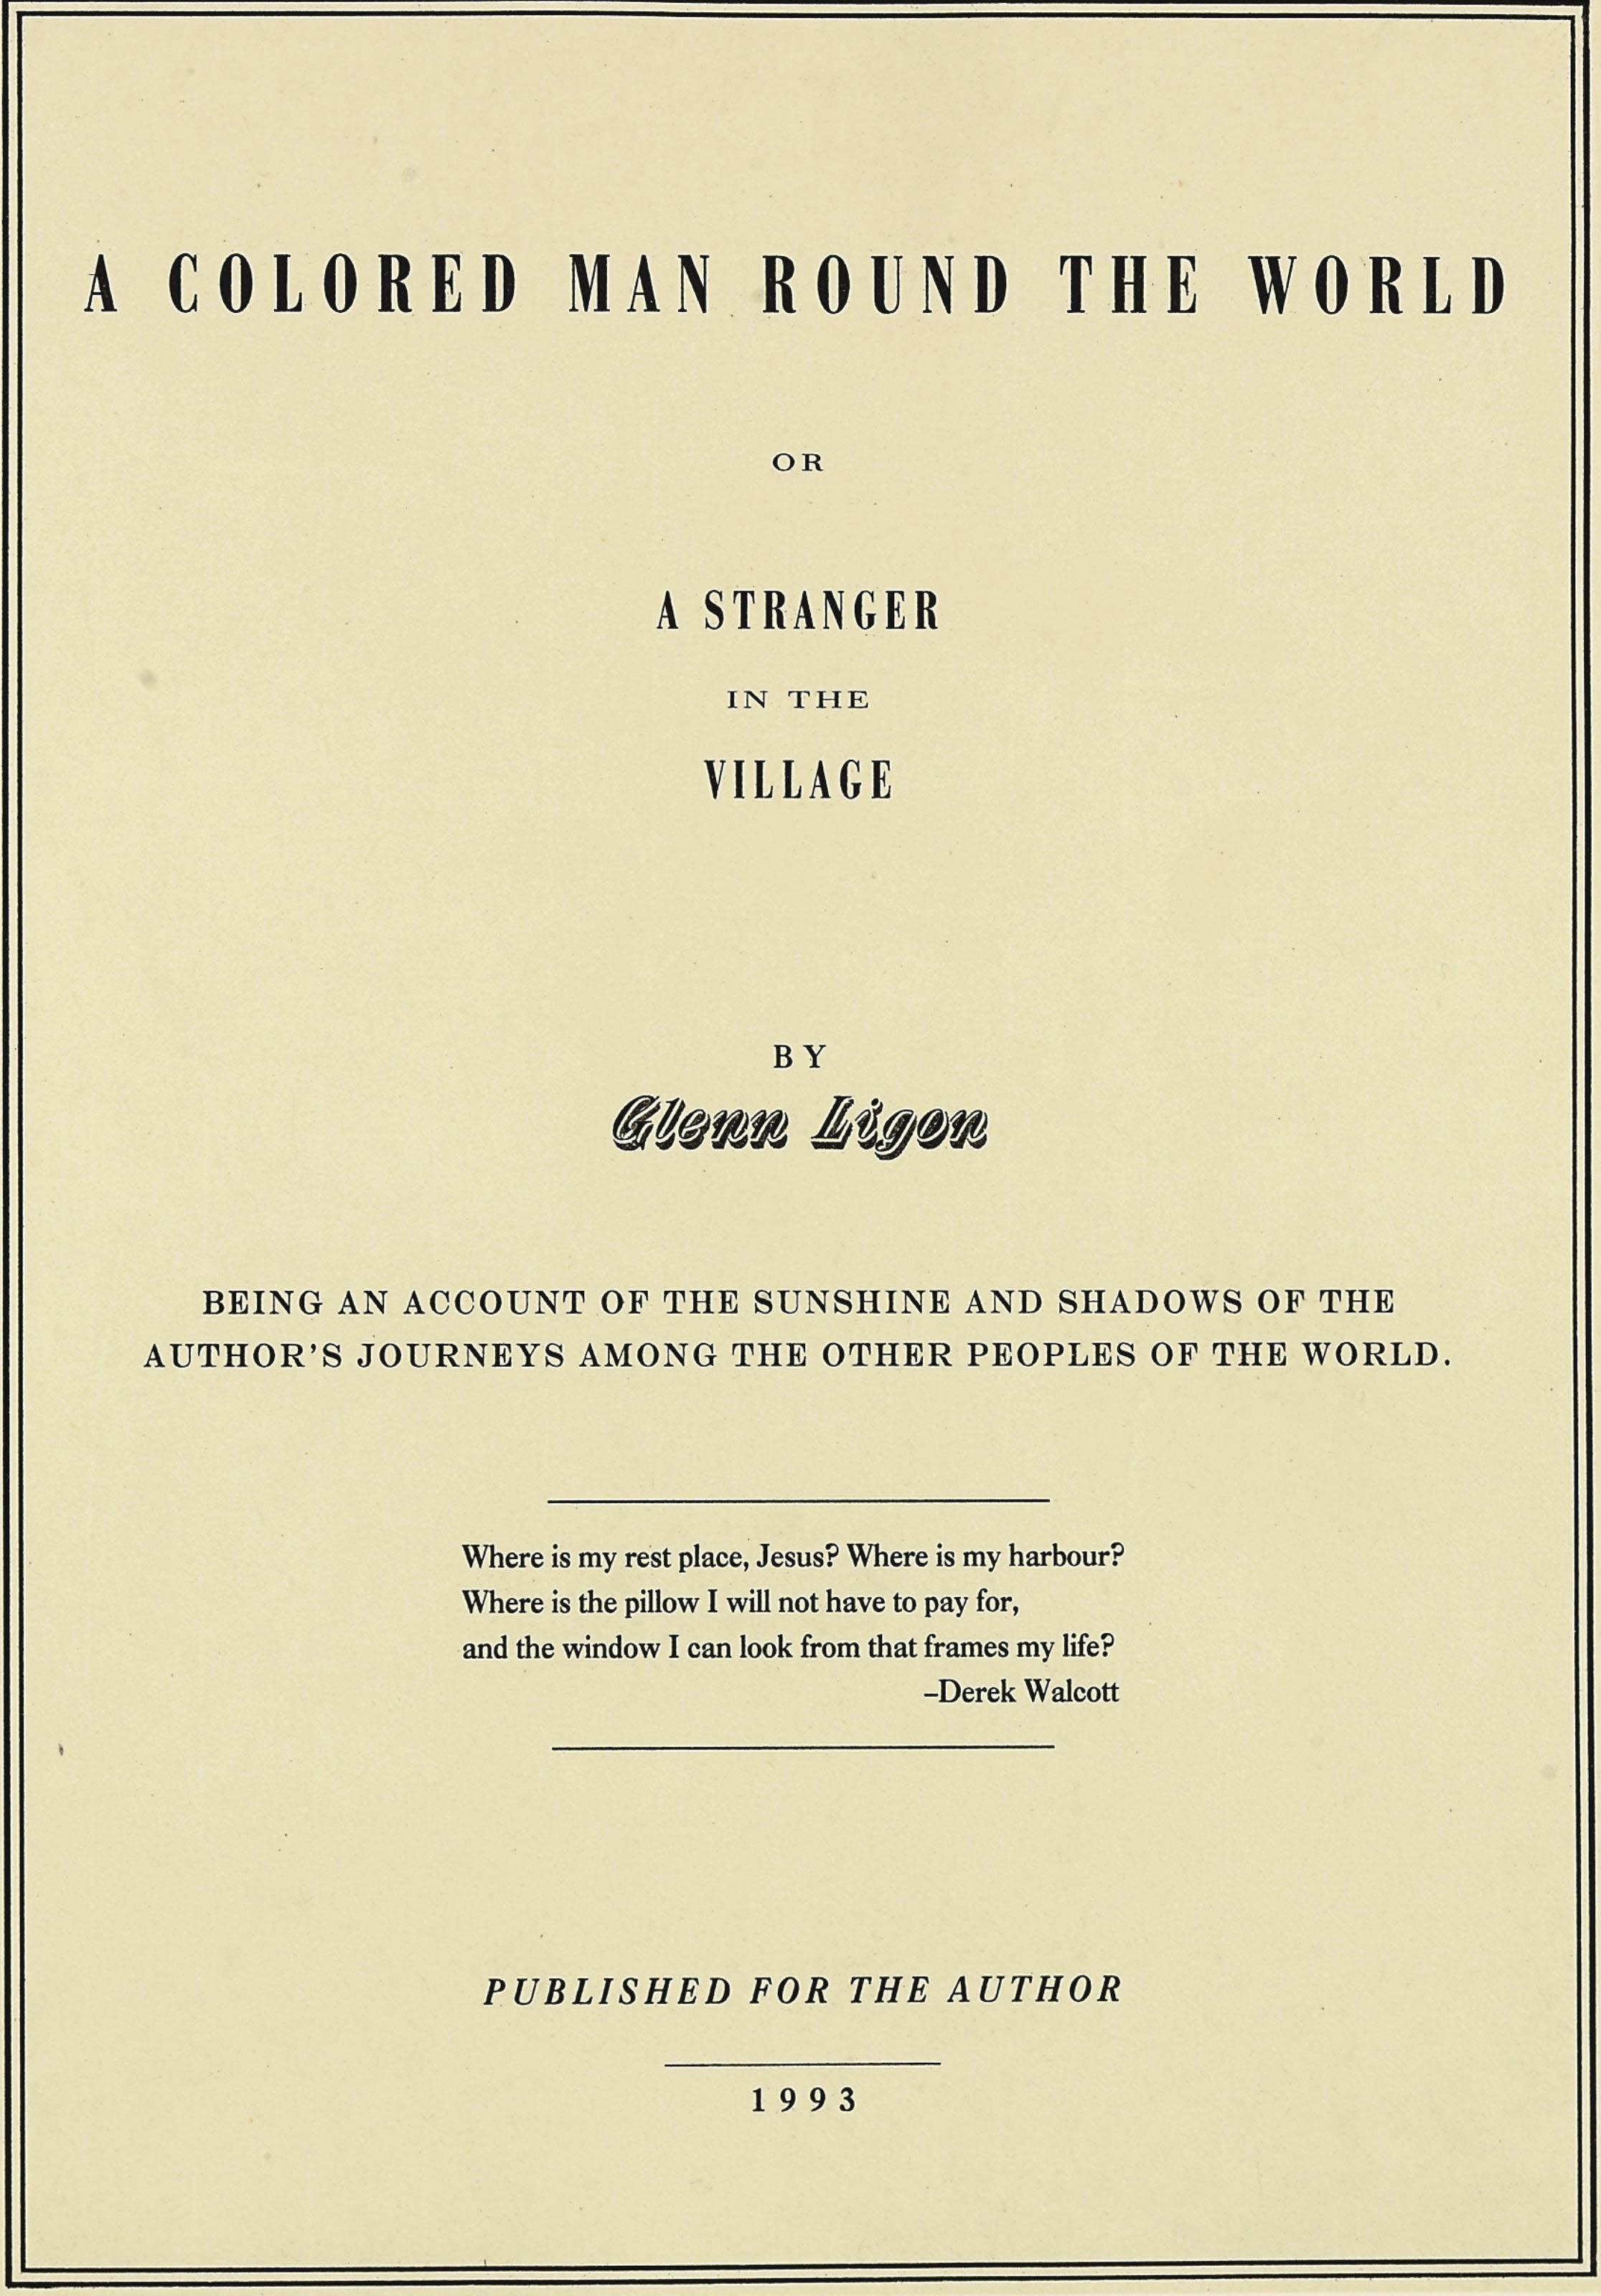 Glenn Ligon (b. 1960)